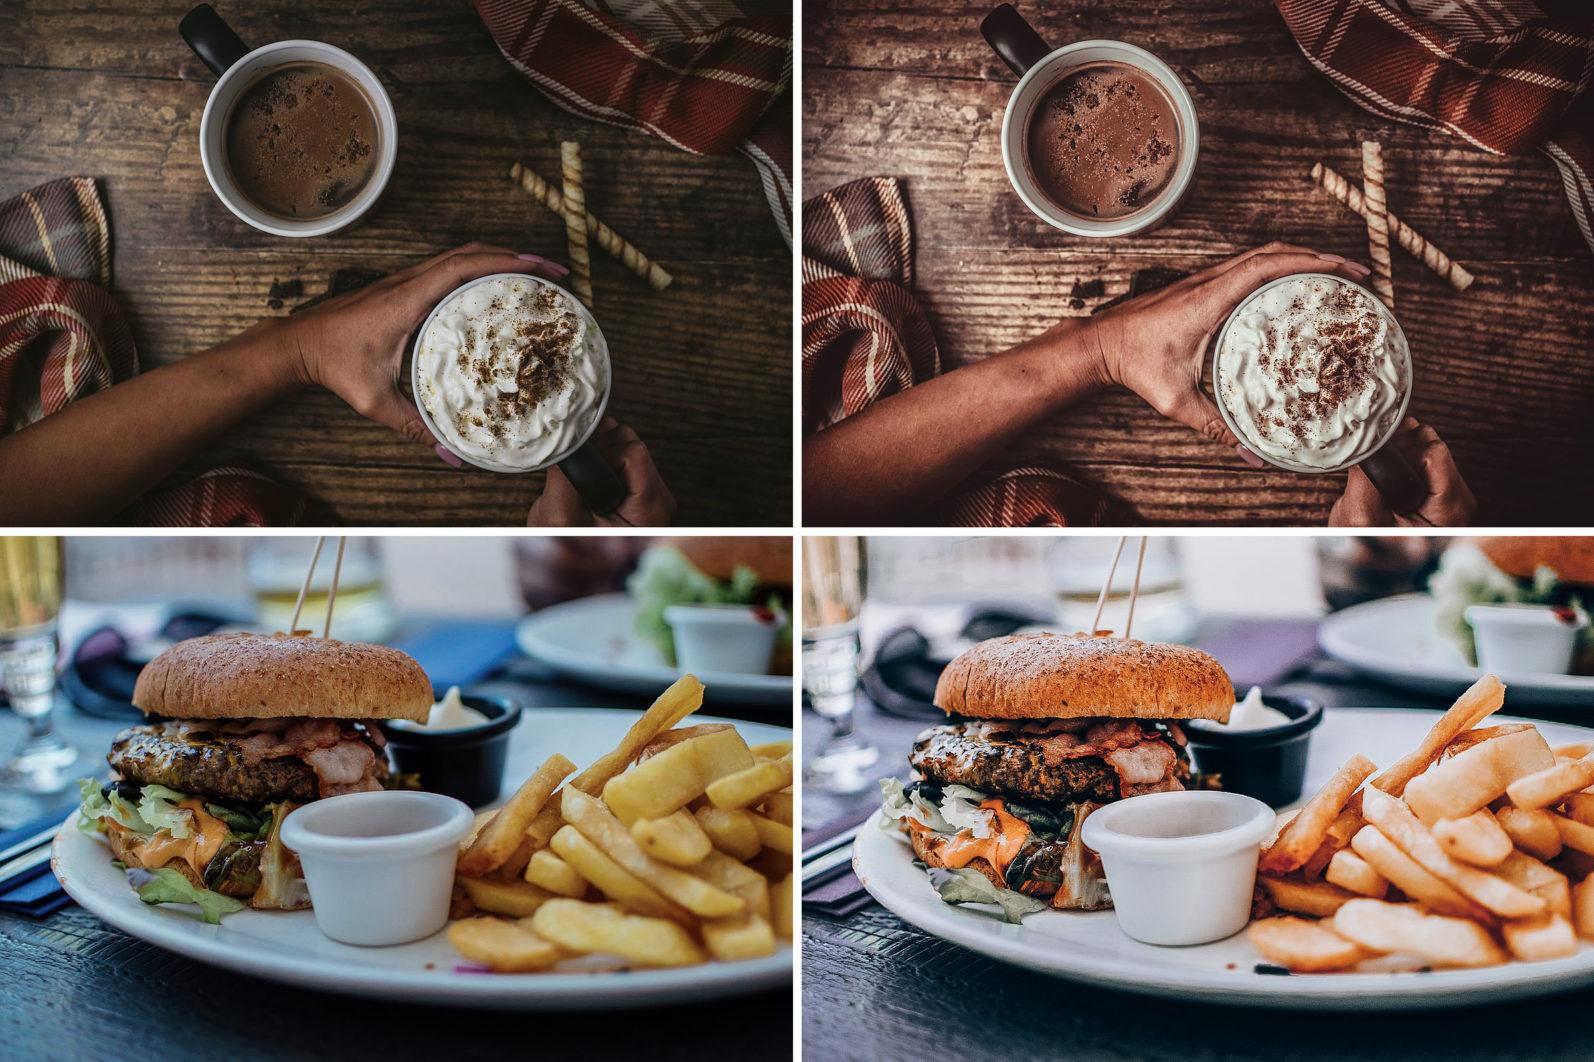 58. Rustic Food - 58.RUSTIC FOOD 13 -